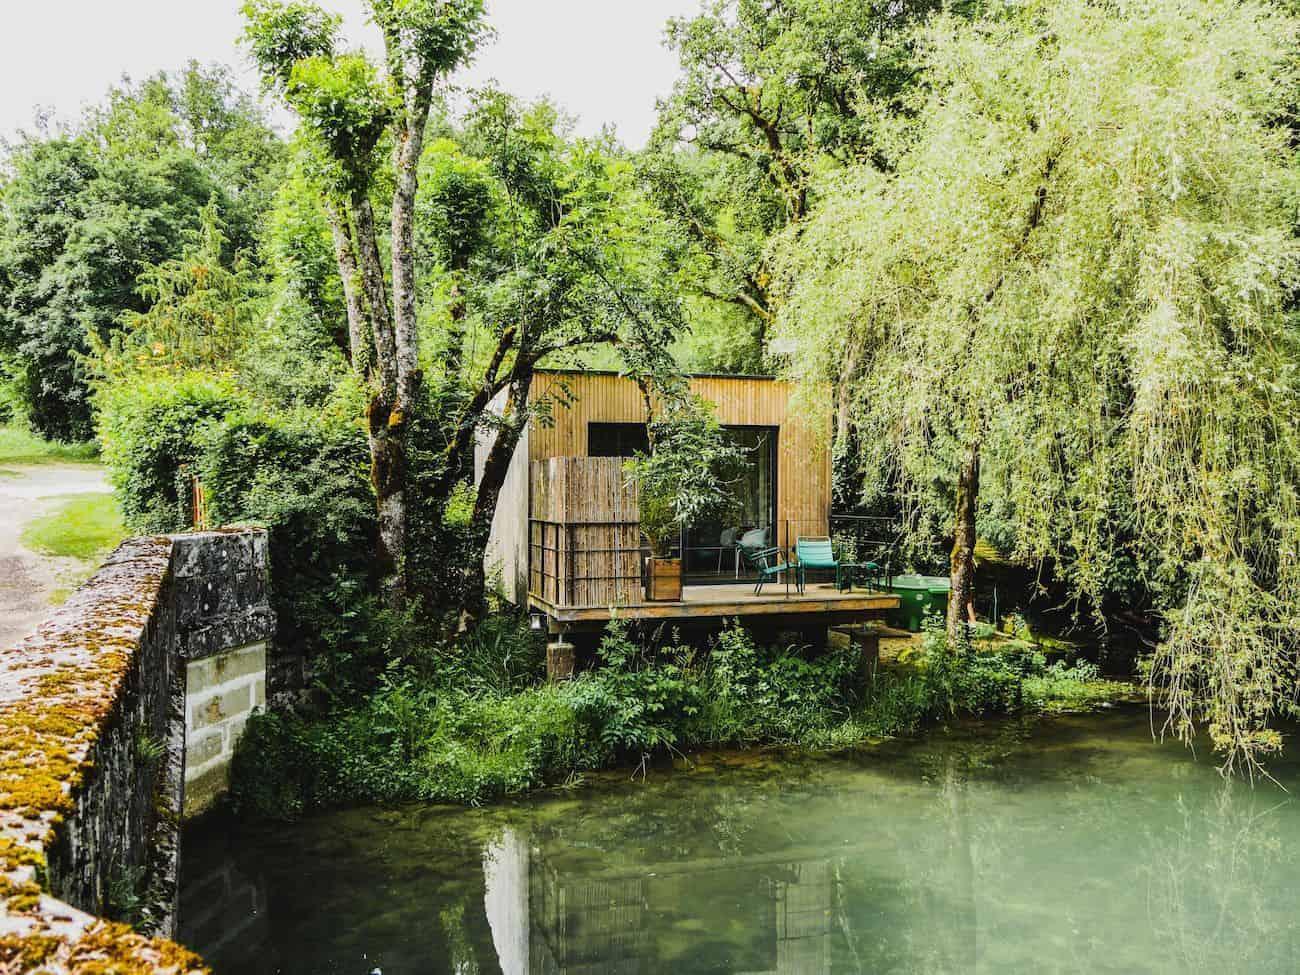 Visiter-Dijon-ou-dormir-pont-roche-et-spa-3